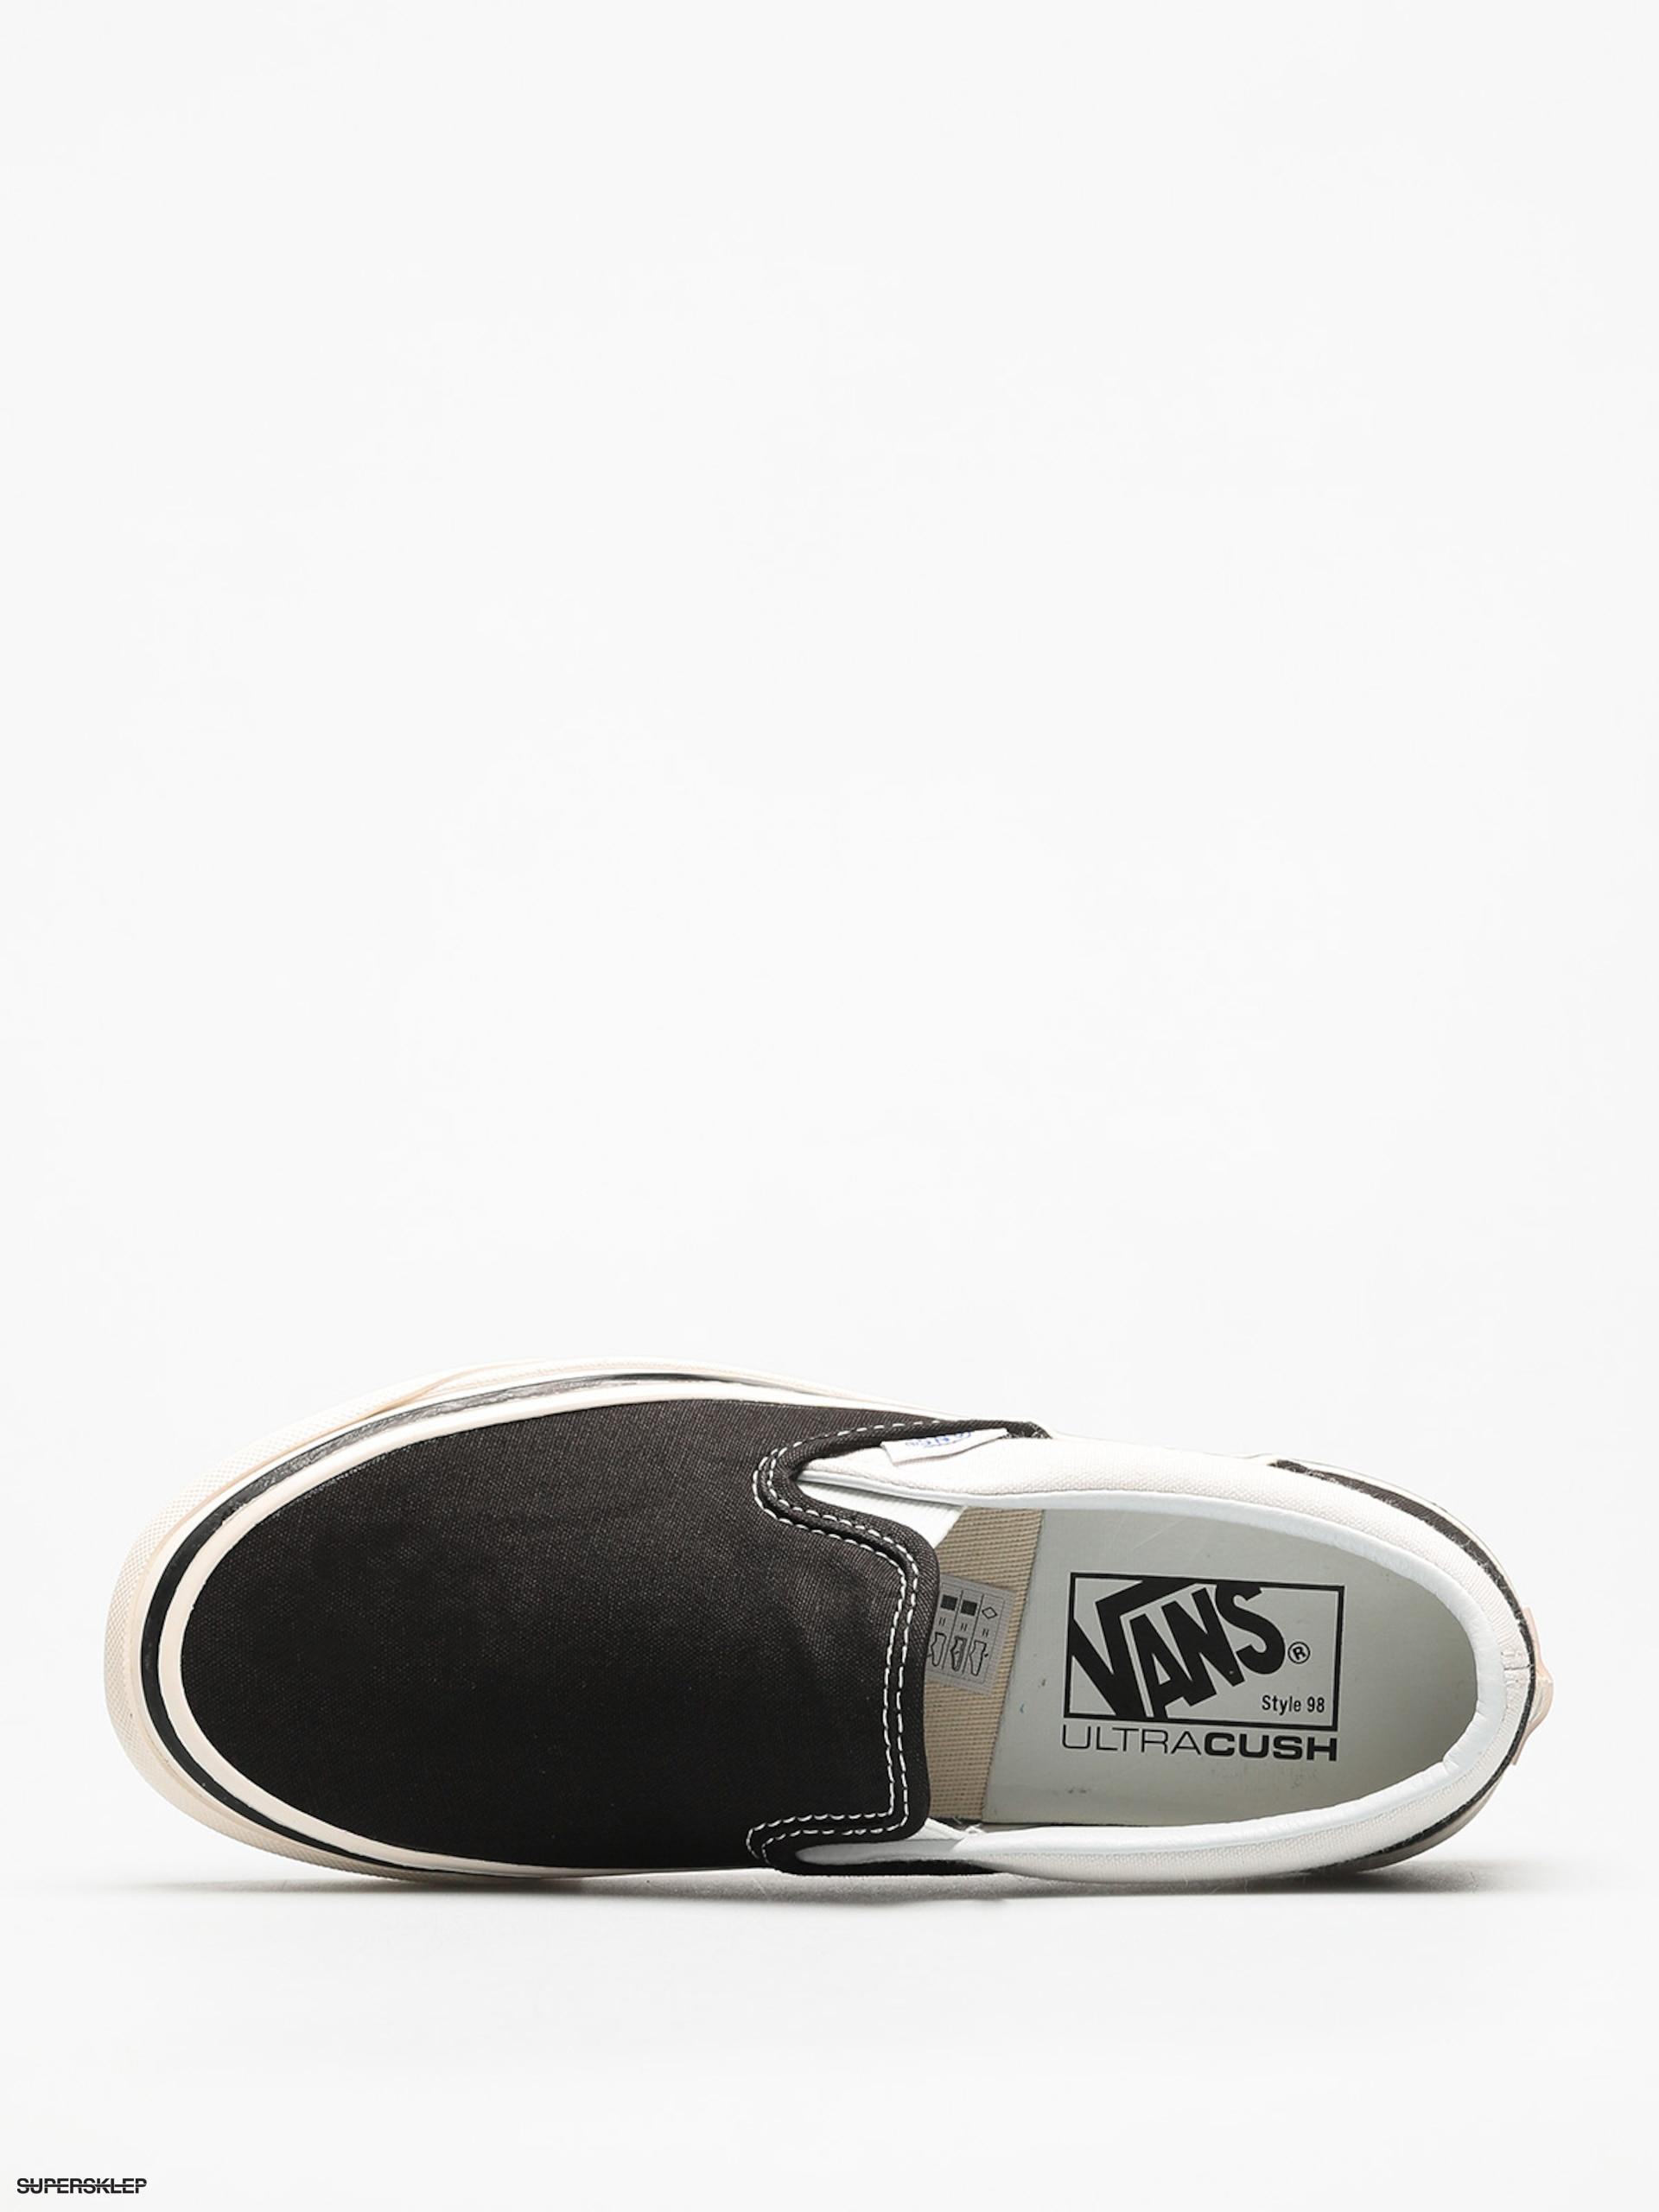 Vans Slip On Anaheim Factory 98 DX BlackWhite